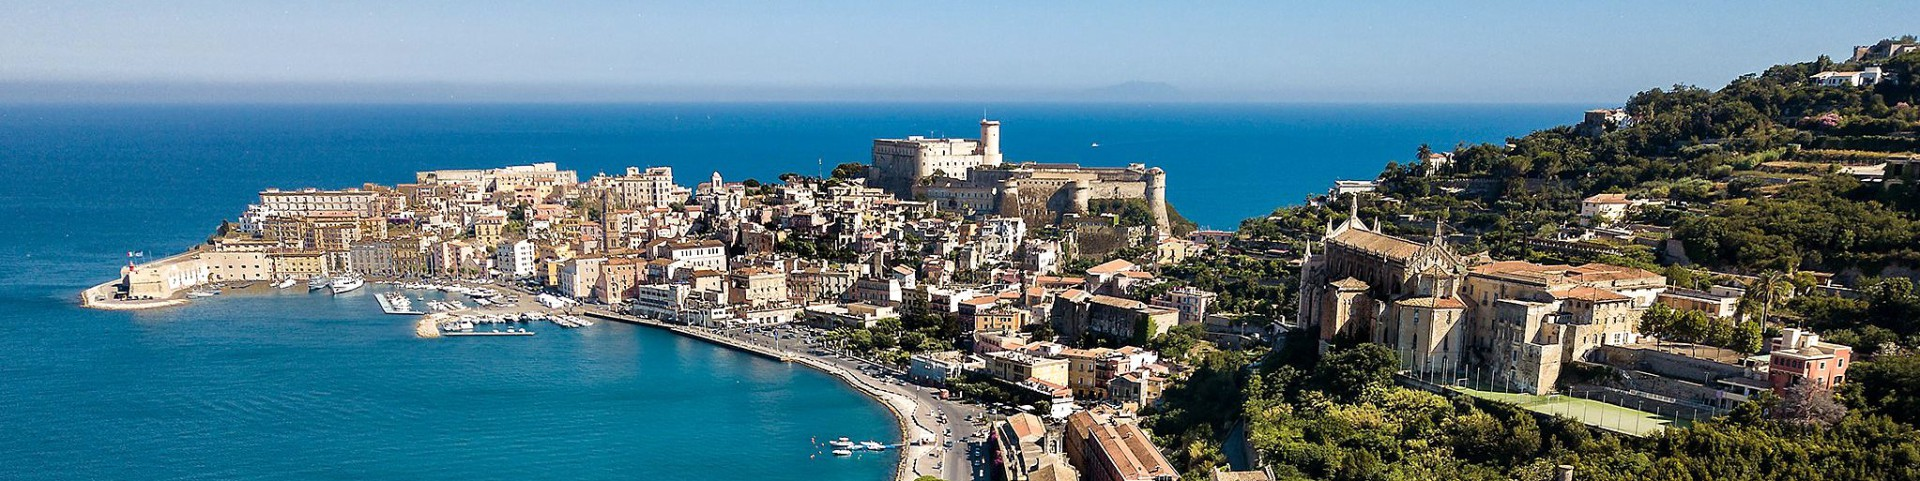 Gaeta, pohled na historické centrum (autor: Daniele Capobianco)